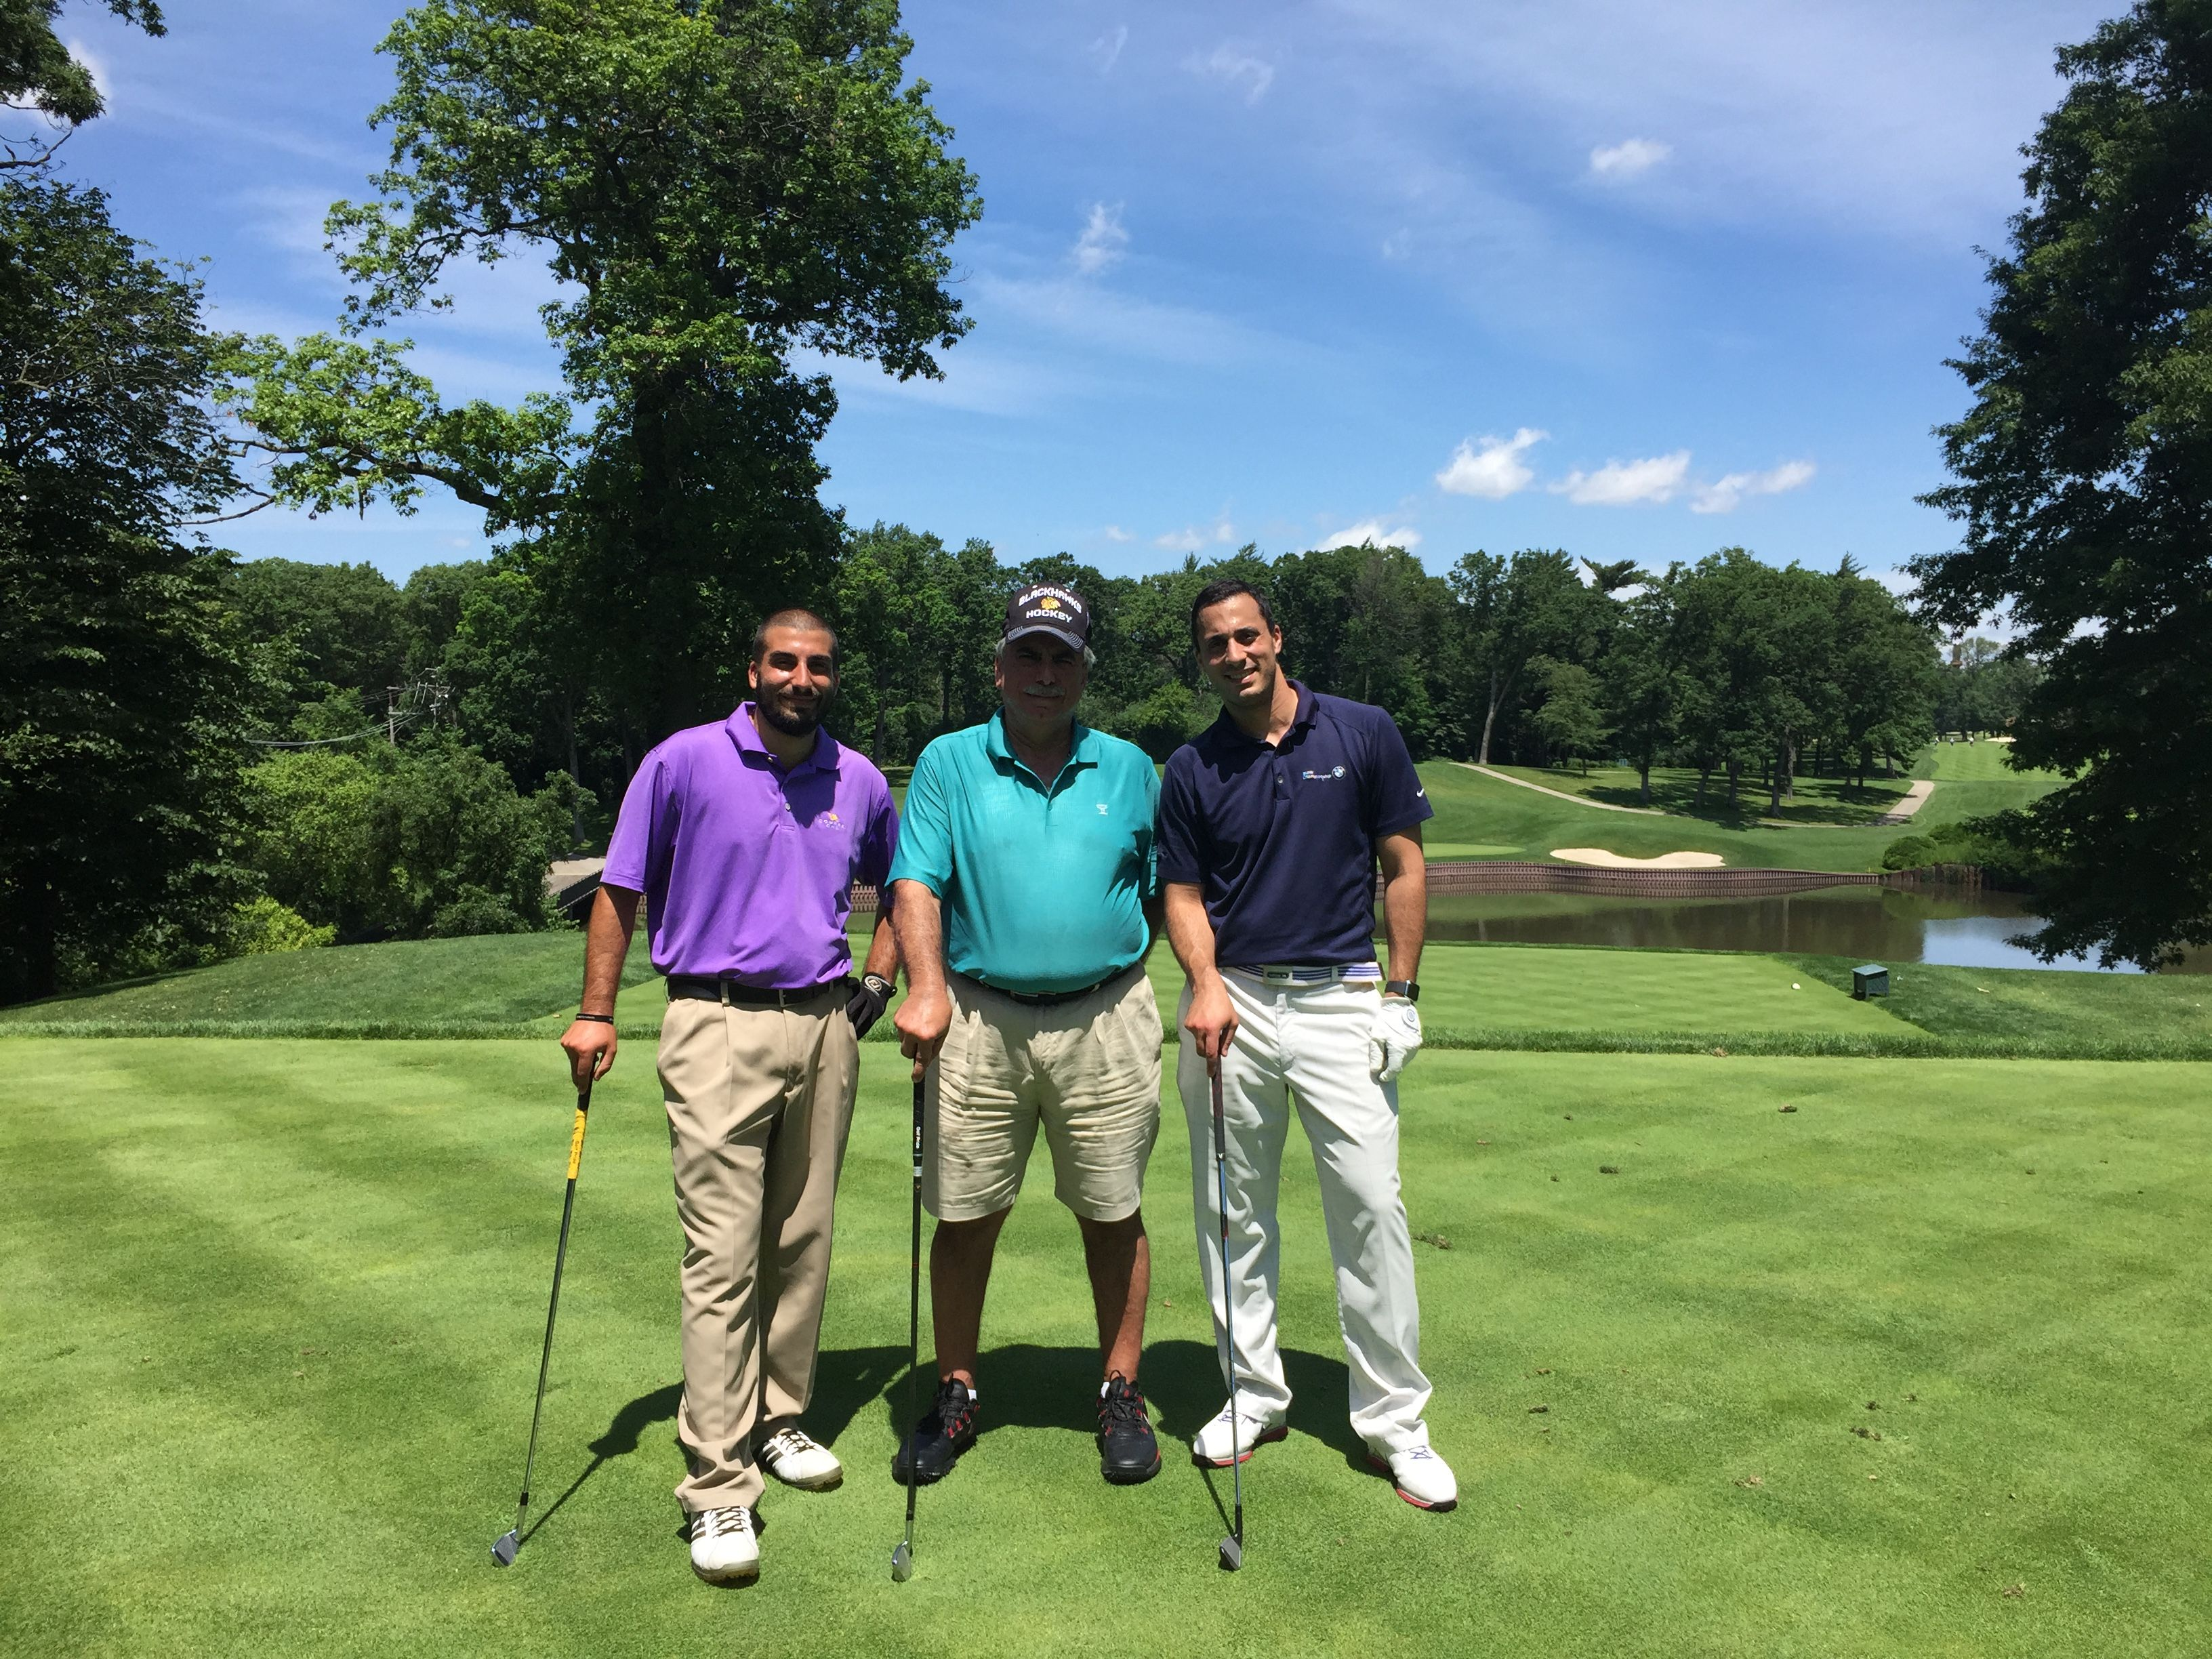 medinah country club outing major championship golf plus